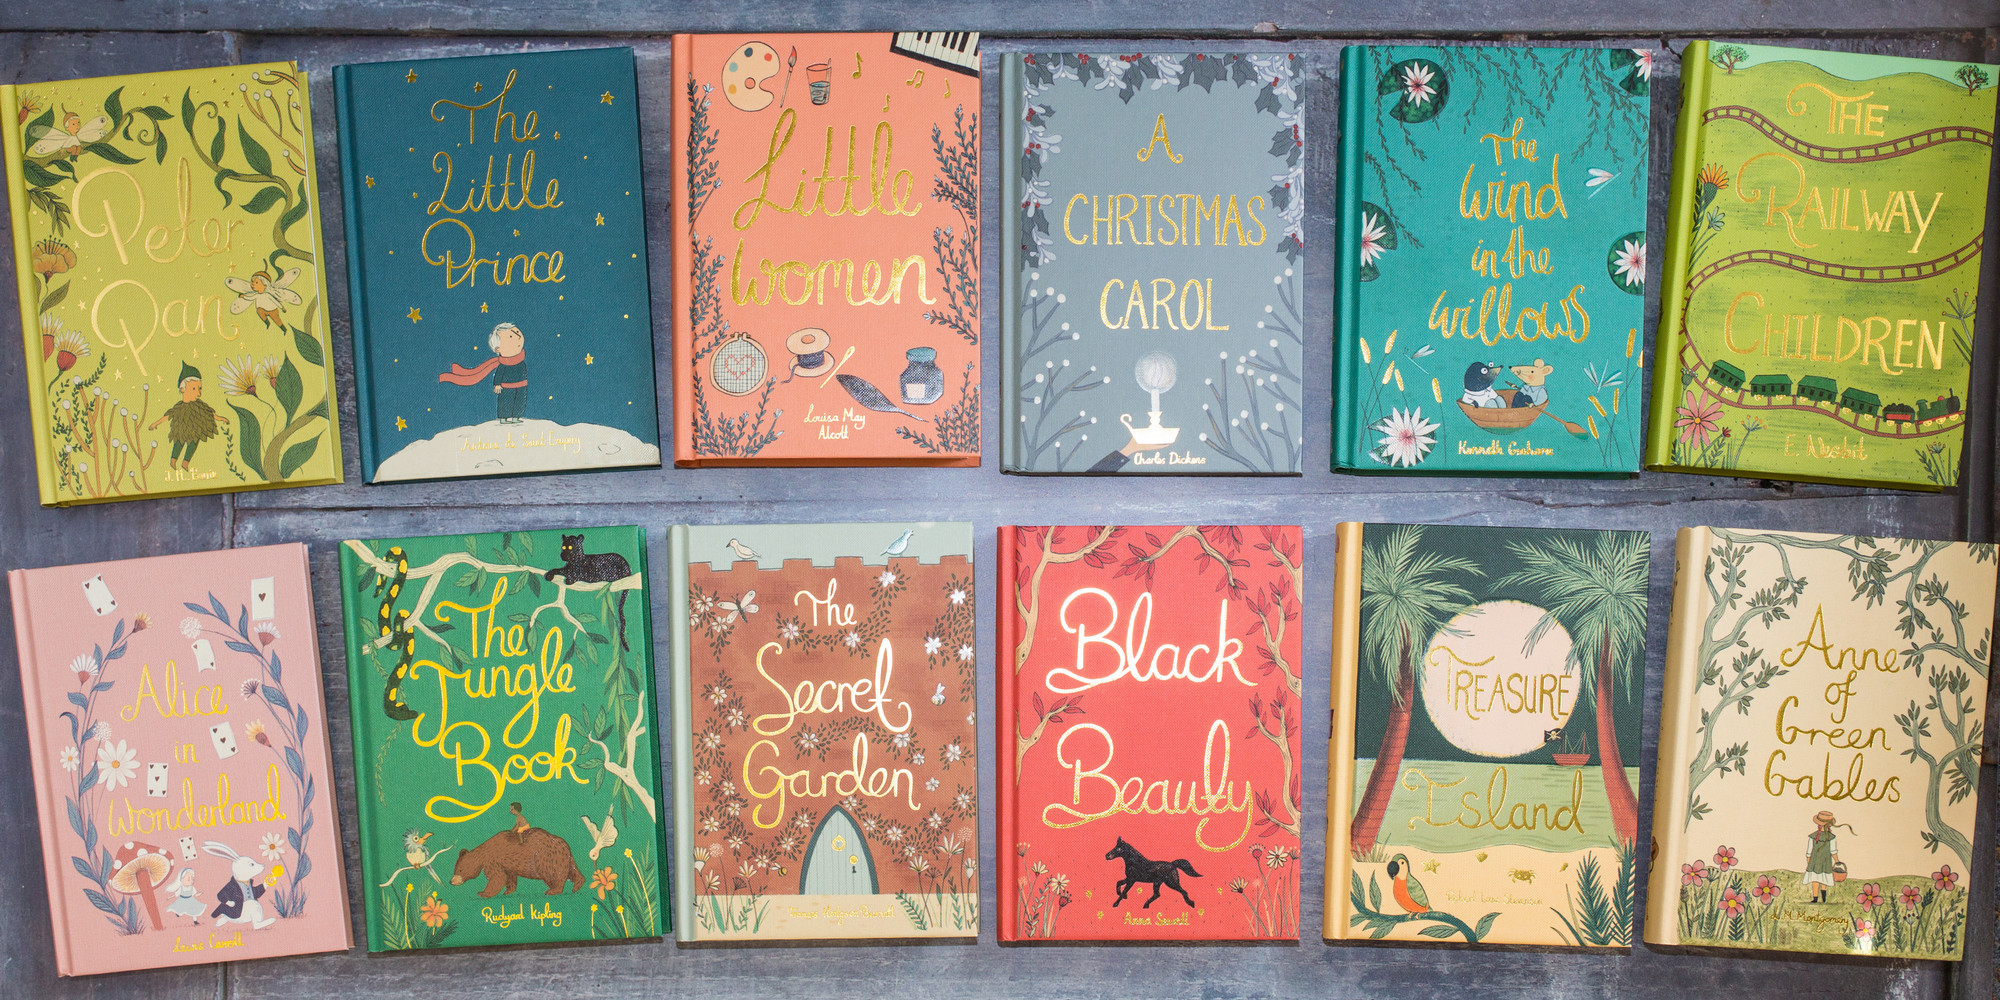 beautifulbooks.info | wordsworth collectors editions full spread